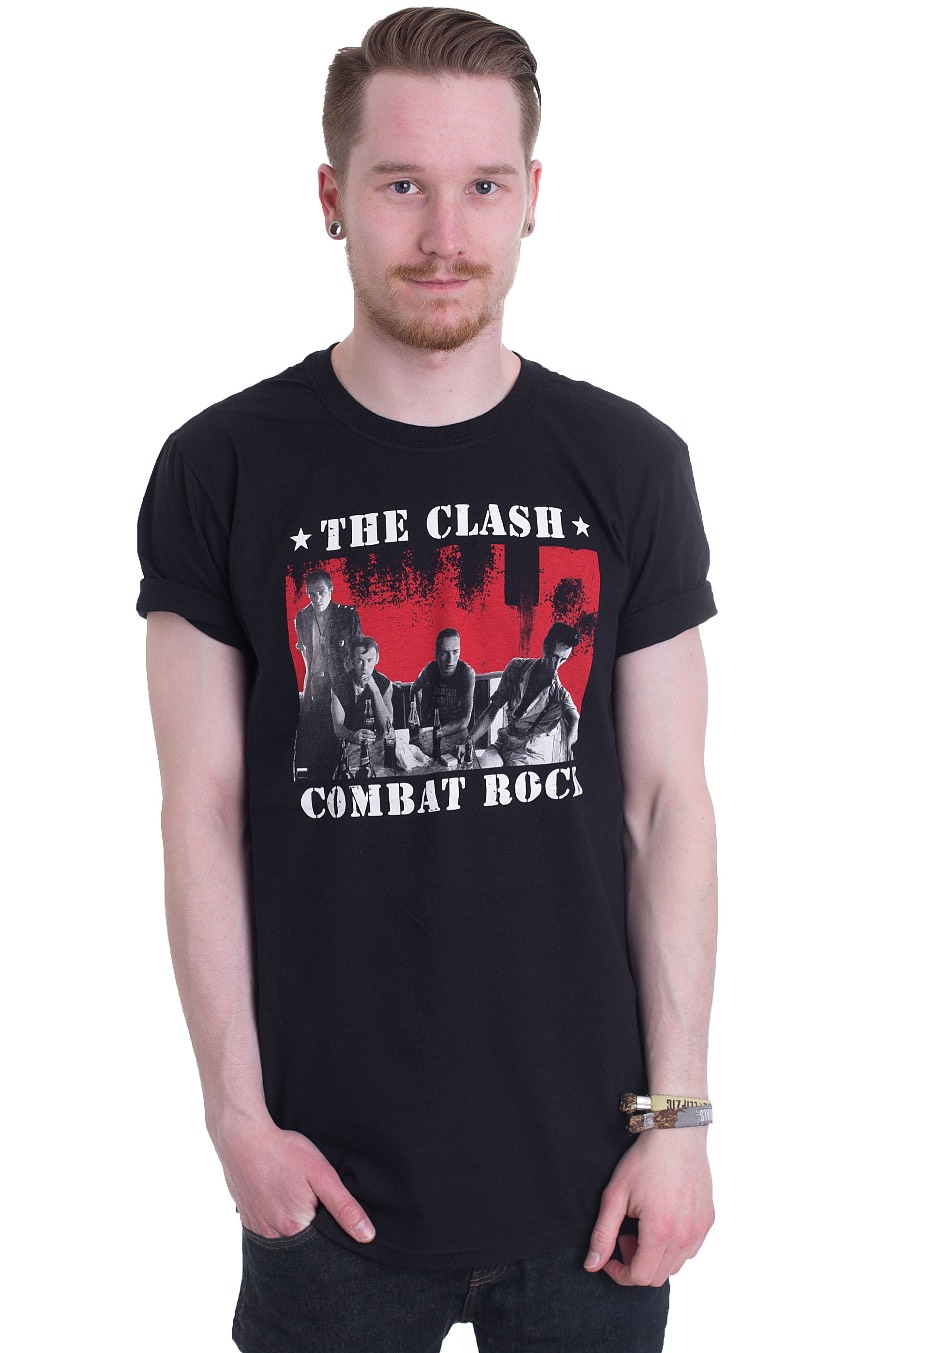 4e1a1a2cbb2 The Clash - Bangkok Combat Rock - T-Shirt - Official Punk Merchandise Shop  - Impericon.com US